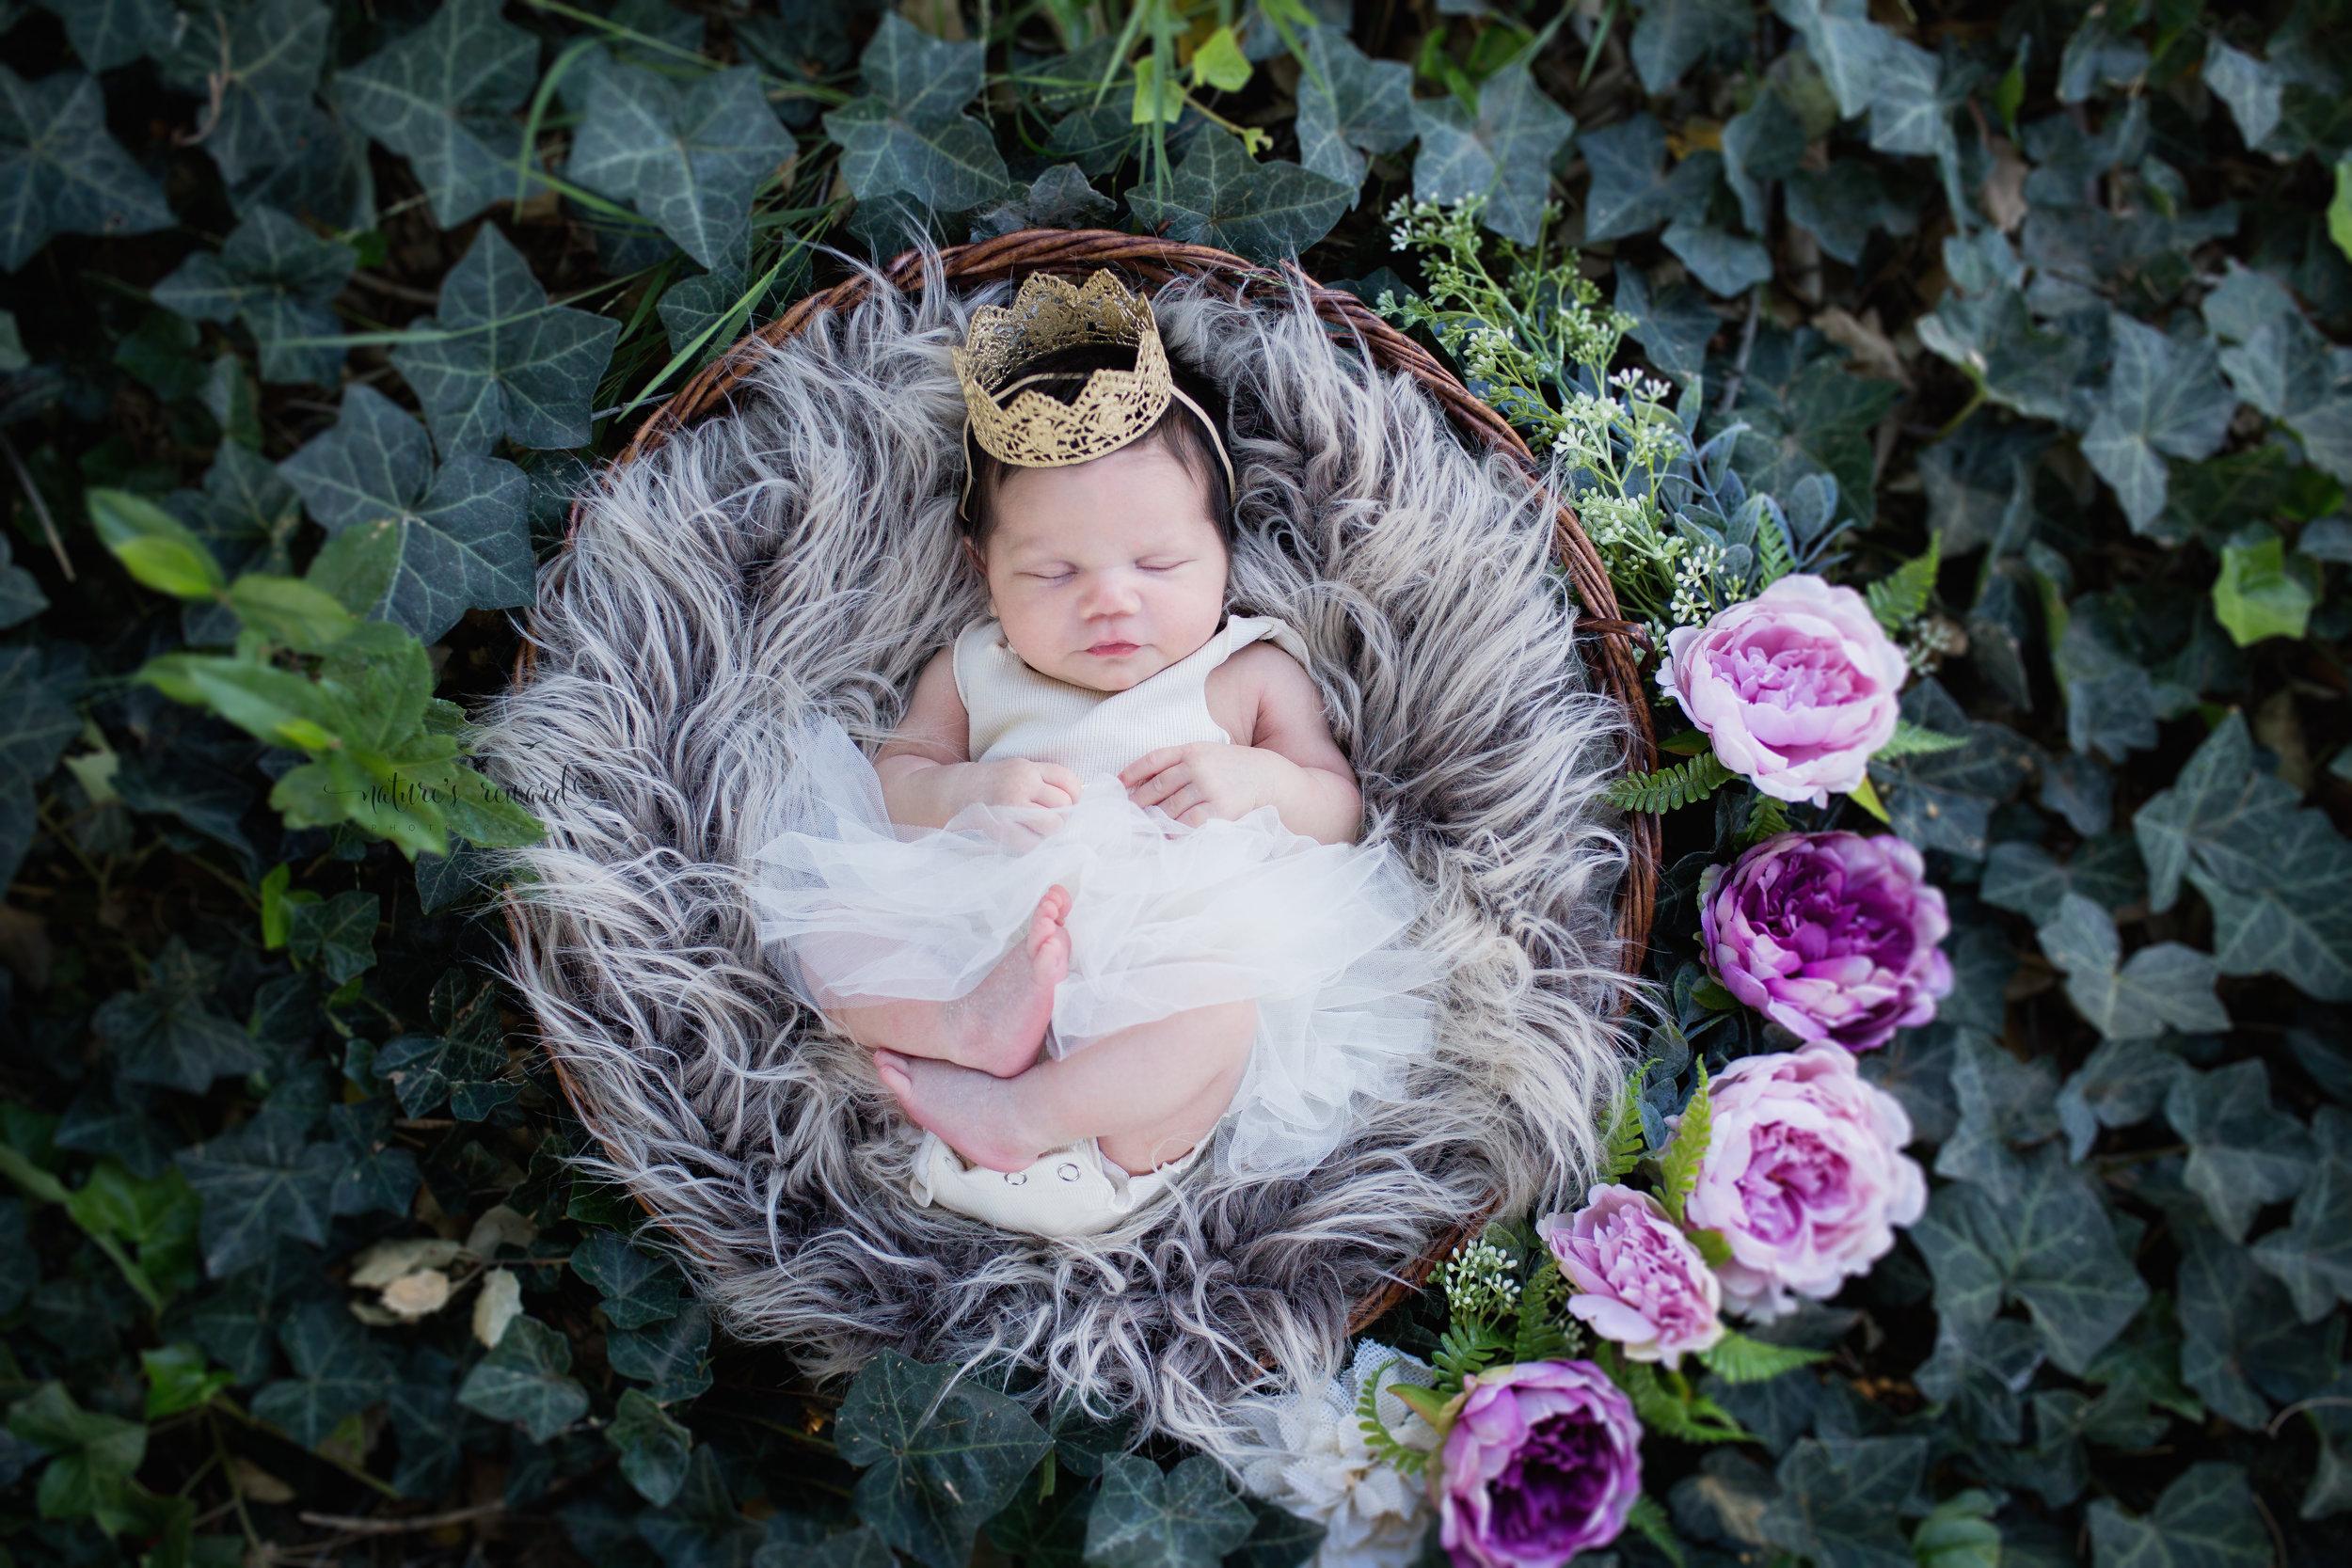 The Ivy Princess